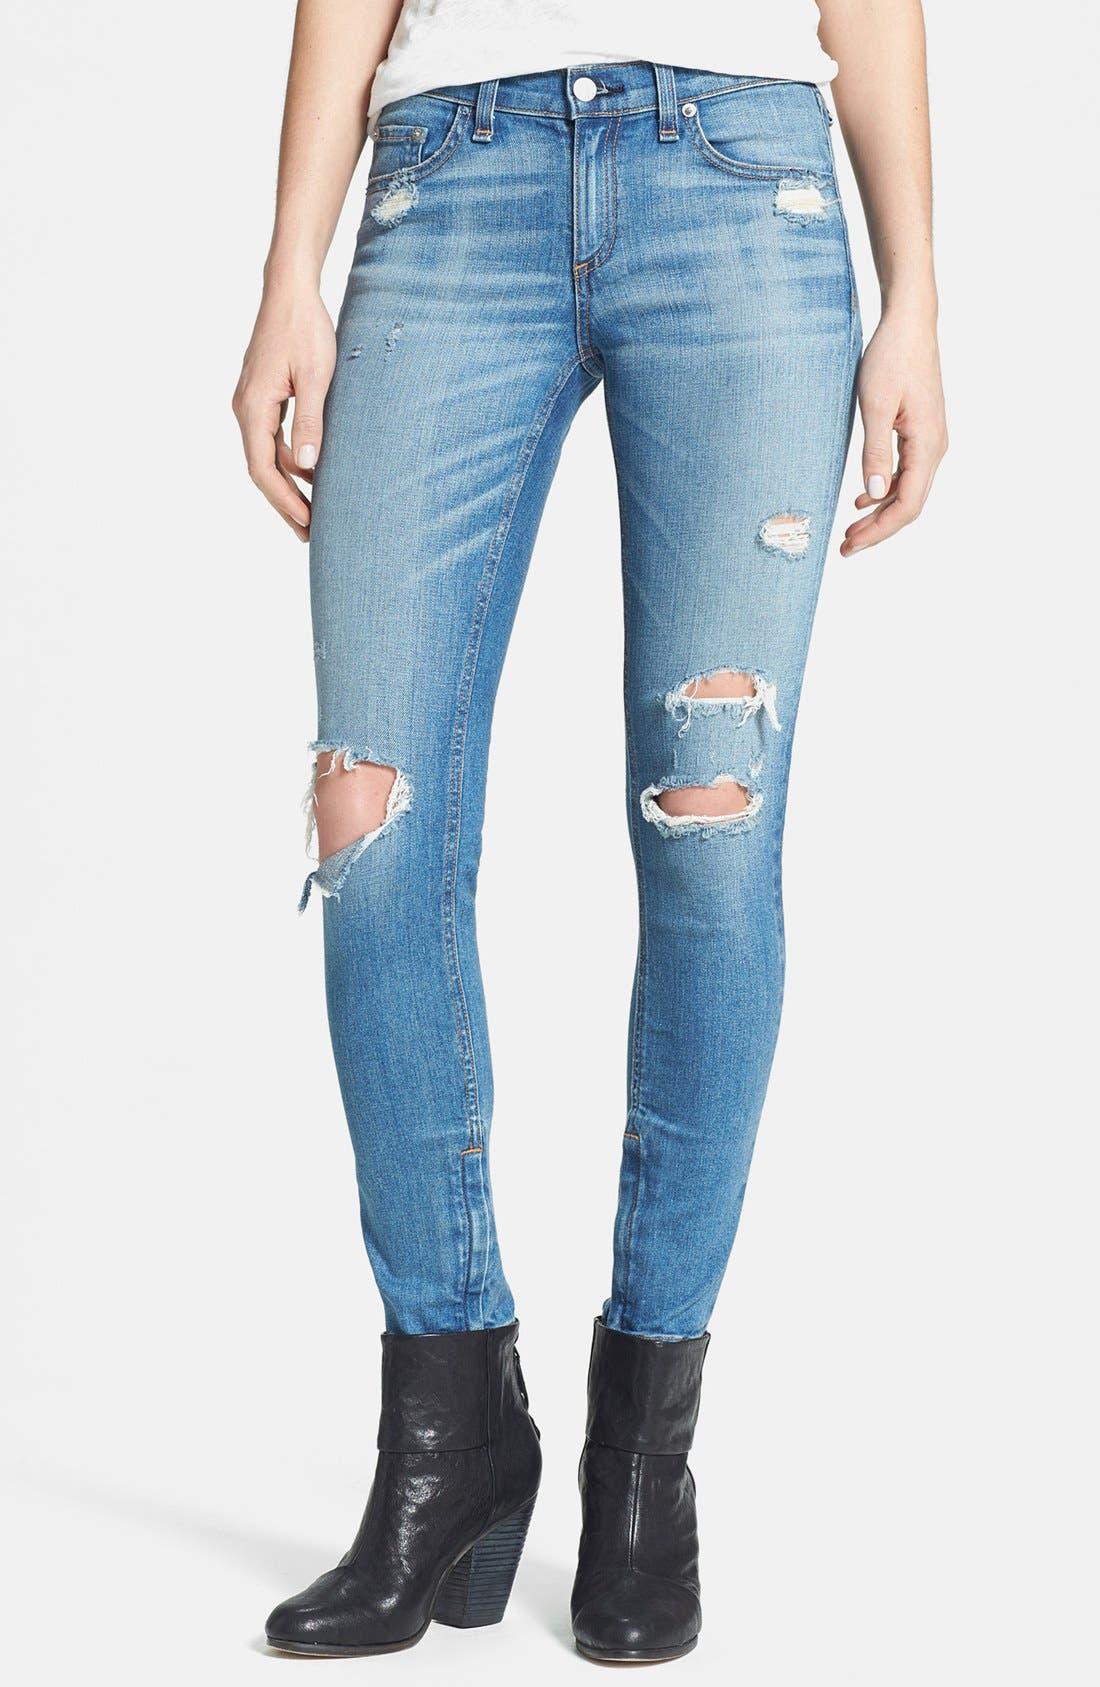 Alternate Image 1 Selected - rag & bone/JEAN Destroyed Skinny Ankle Jeans (Shredded)